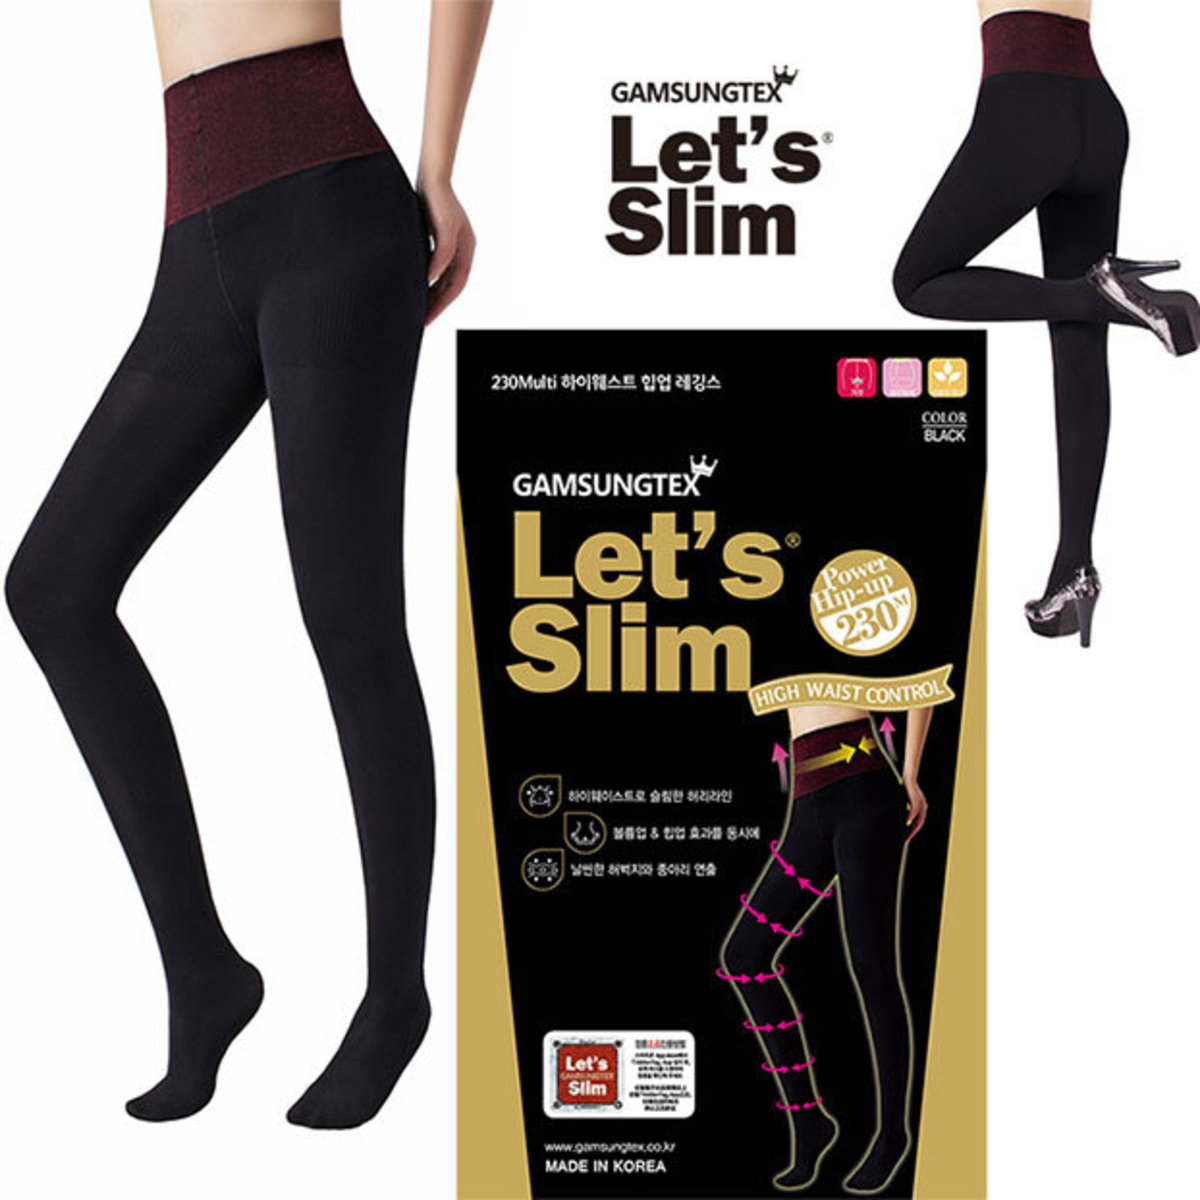 Lets Slim 230m Slimming Leggings[Parallel Import]